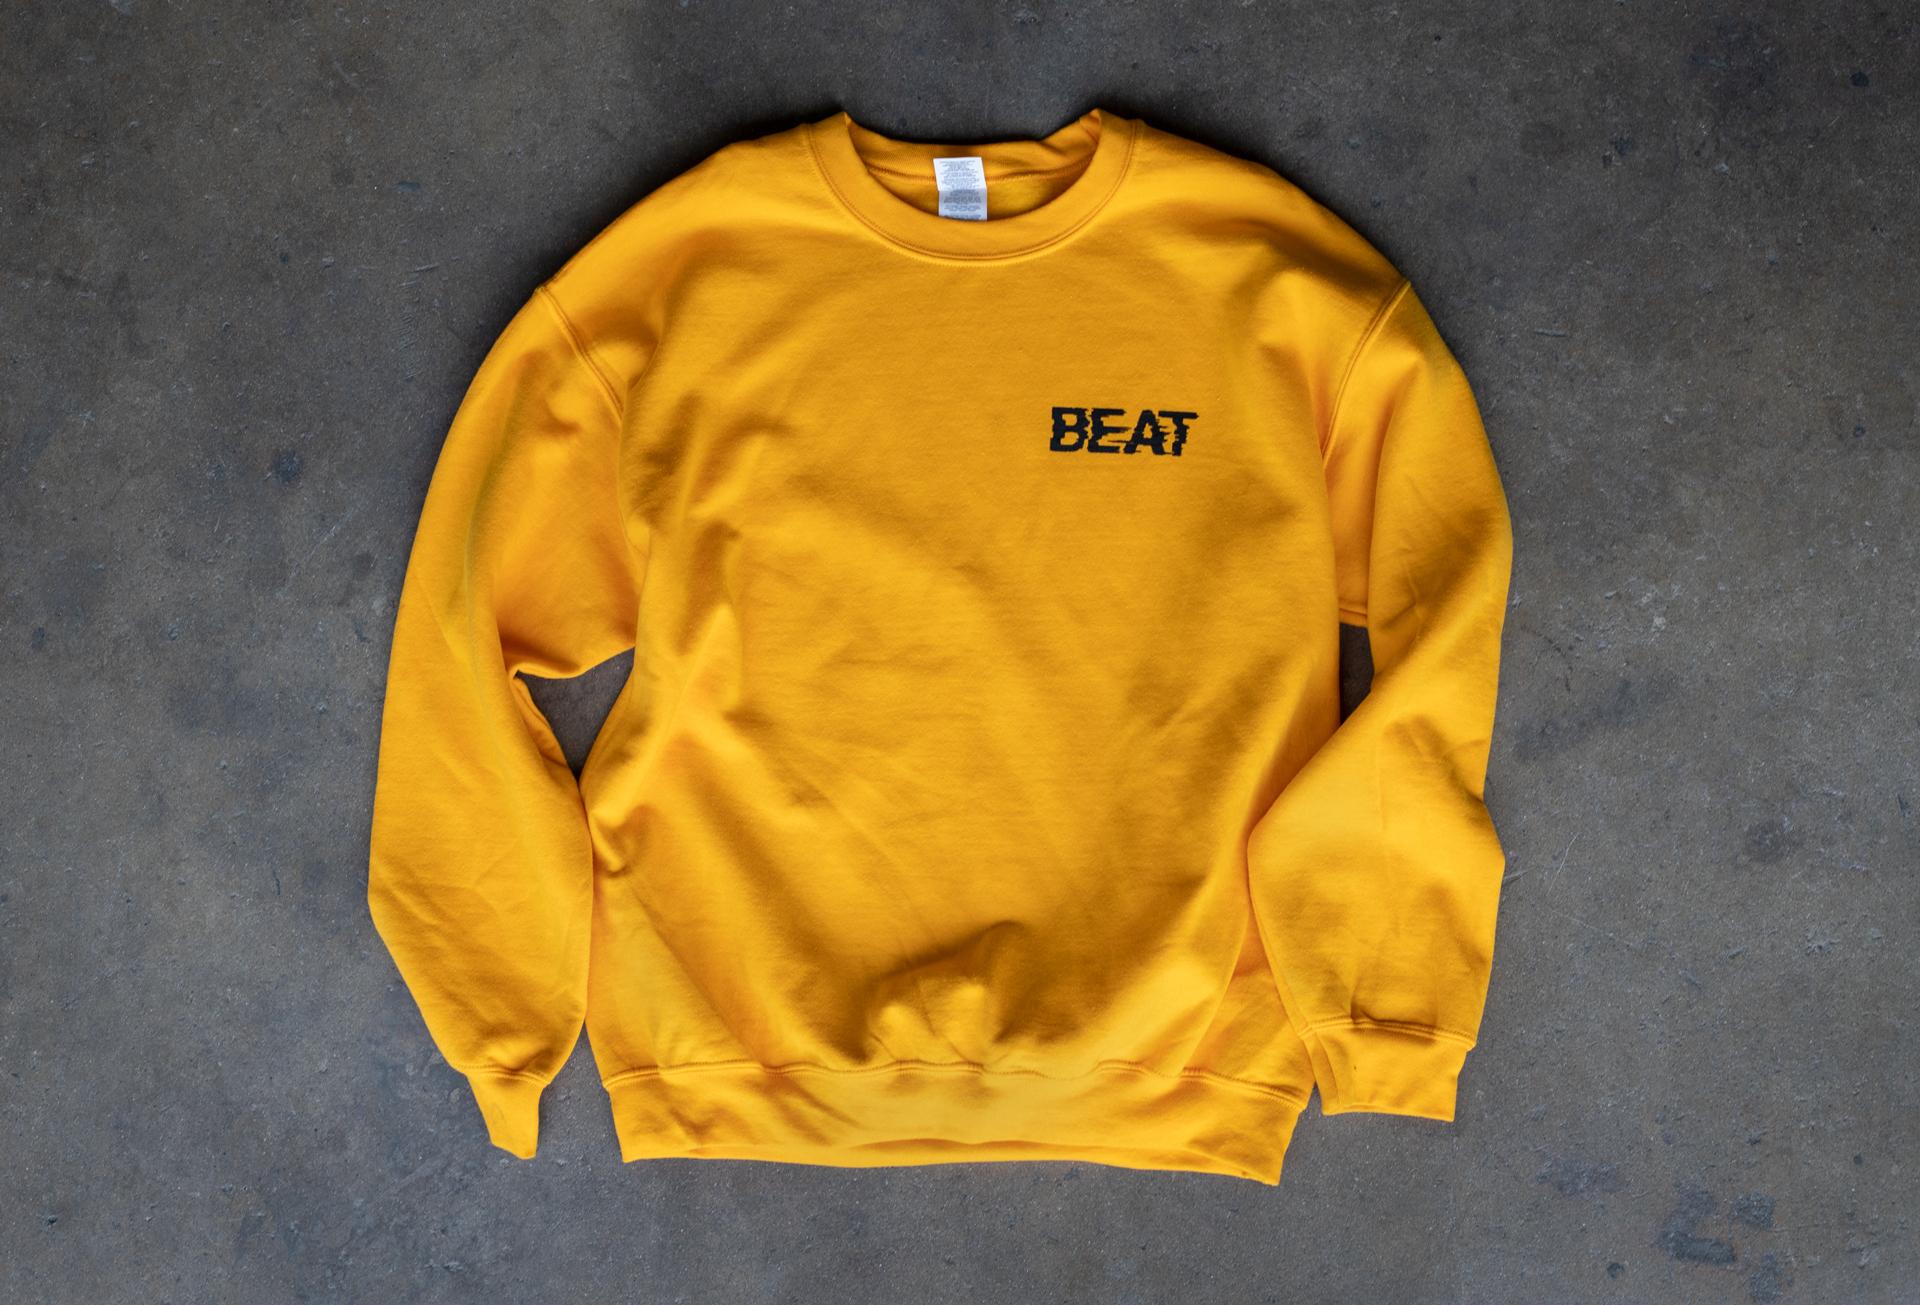 beat-sweater-on-concrete.jpg